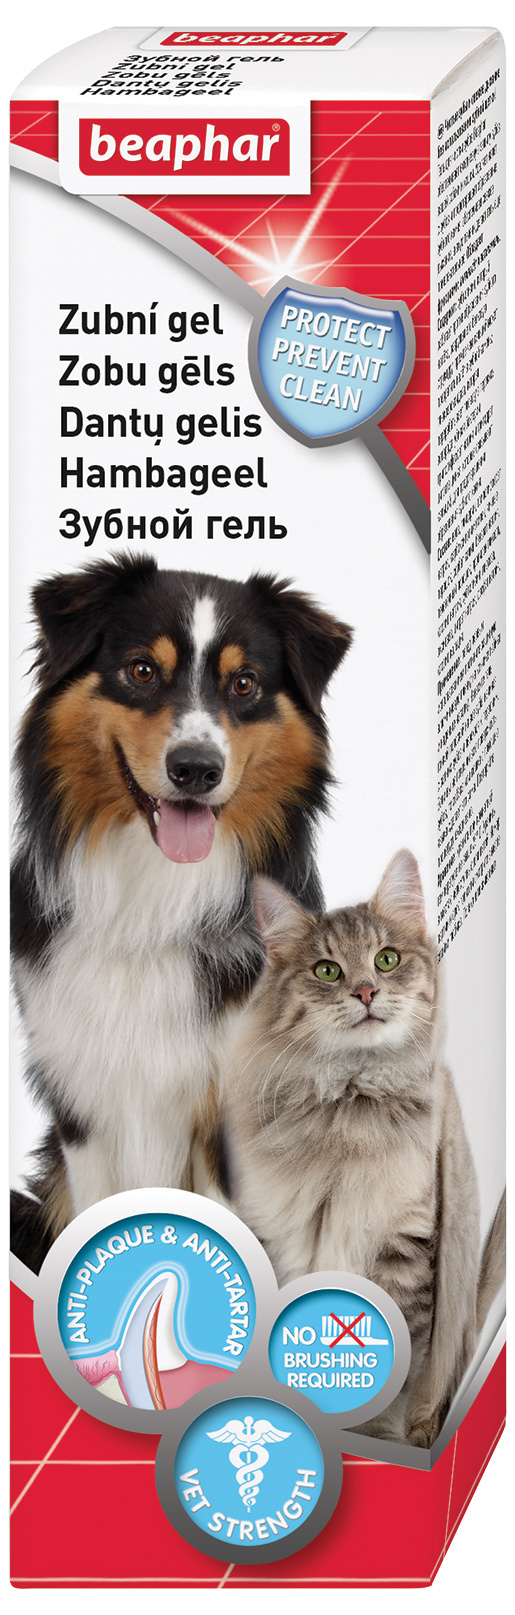 Zobu gēls dzīvniekiem - Beaphar Dog A Dent Gel, 100 g